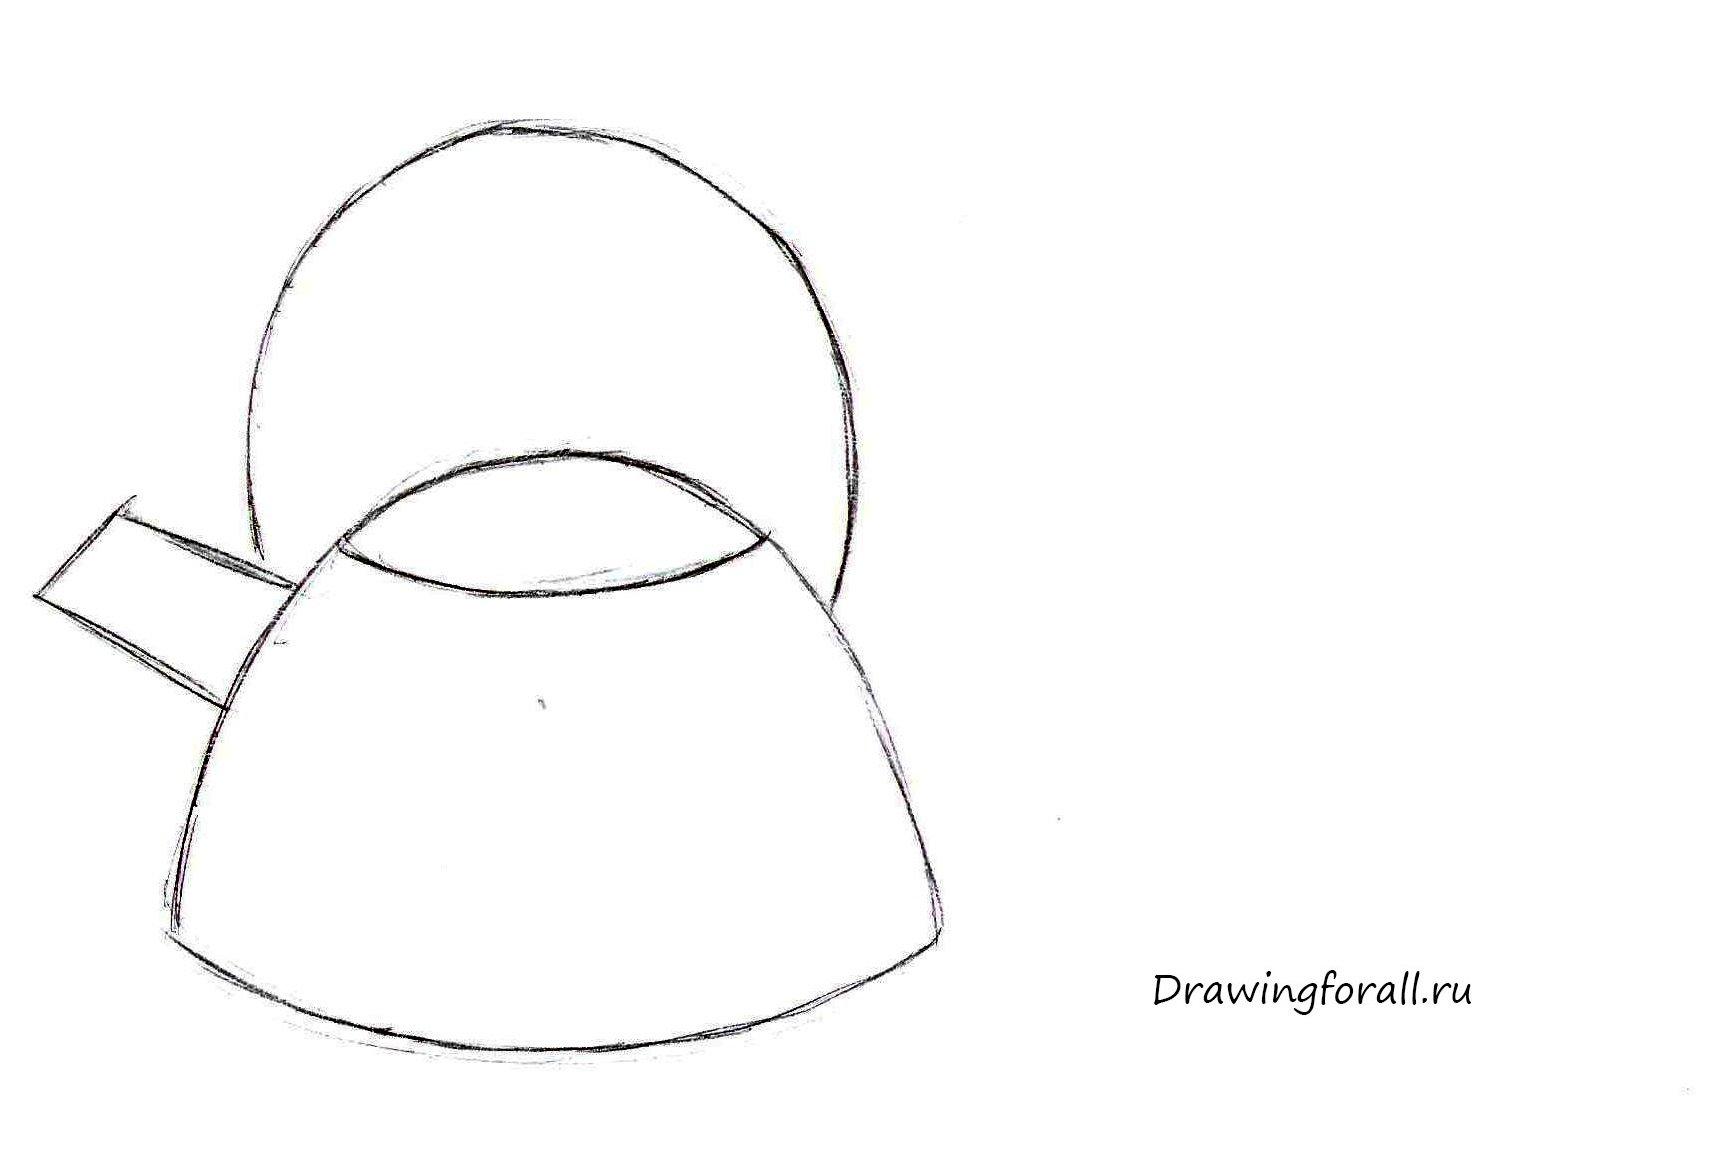 чайника для рисунки карандашом